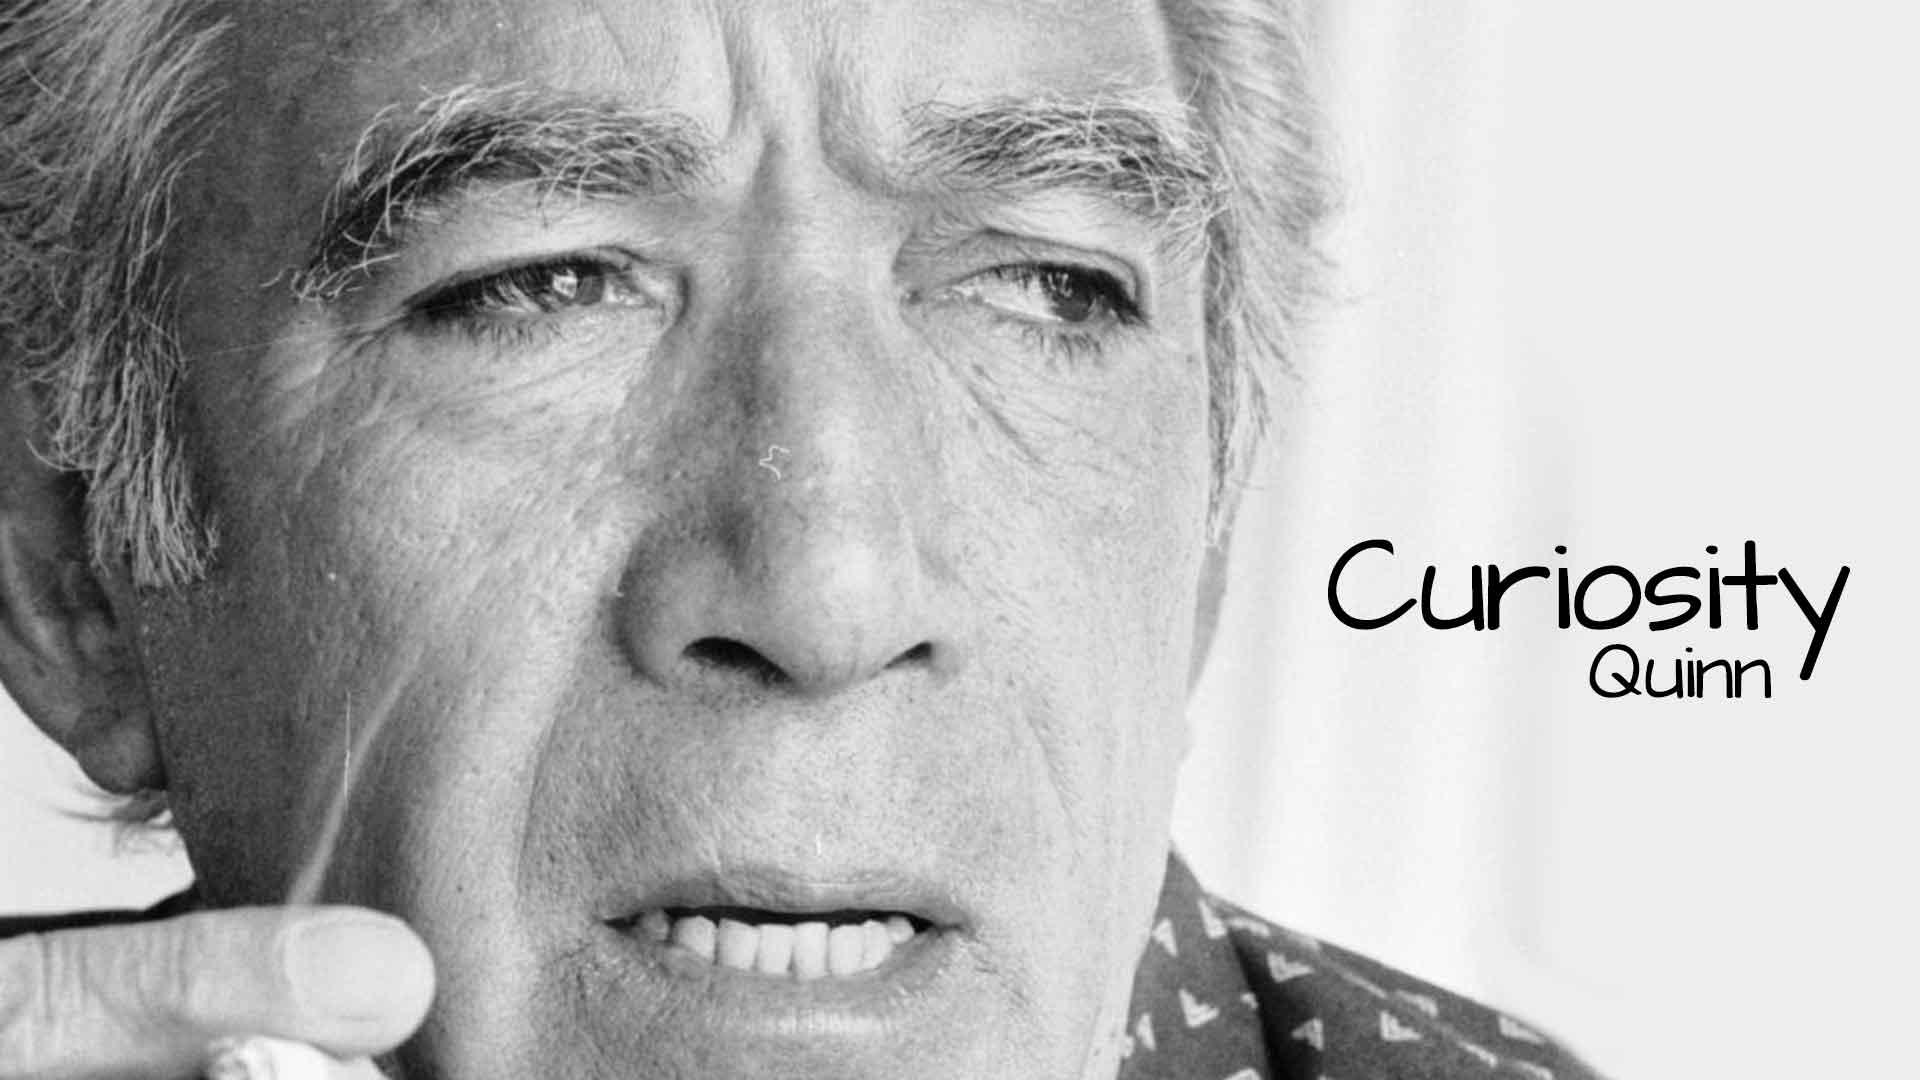 Curiosity – Quinn